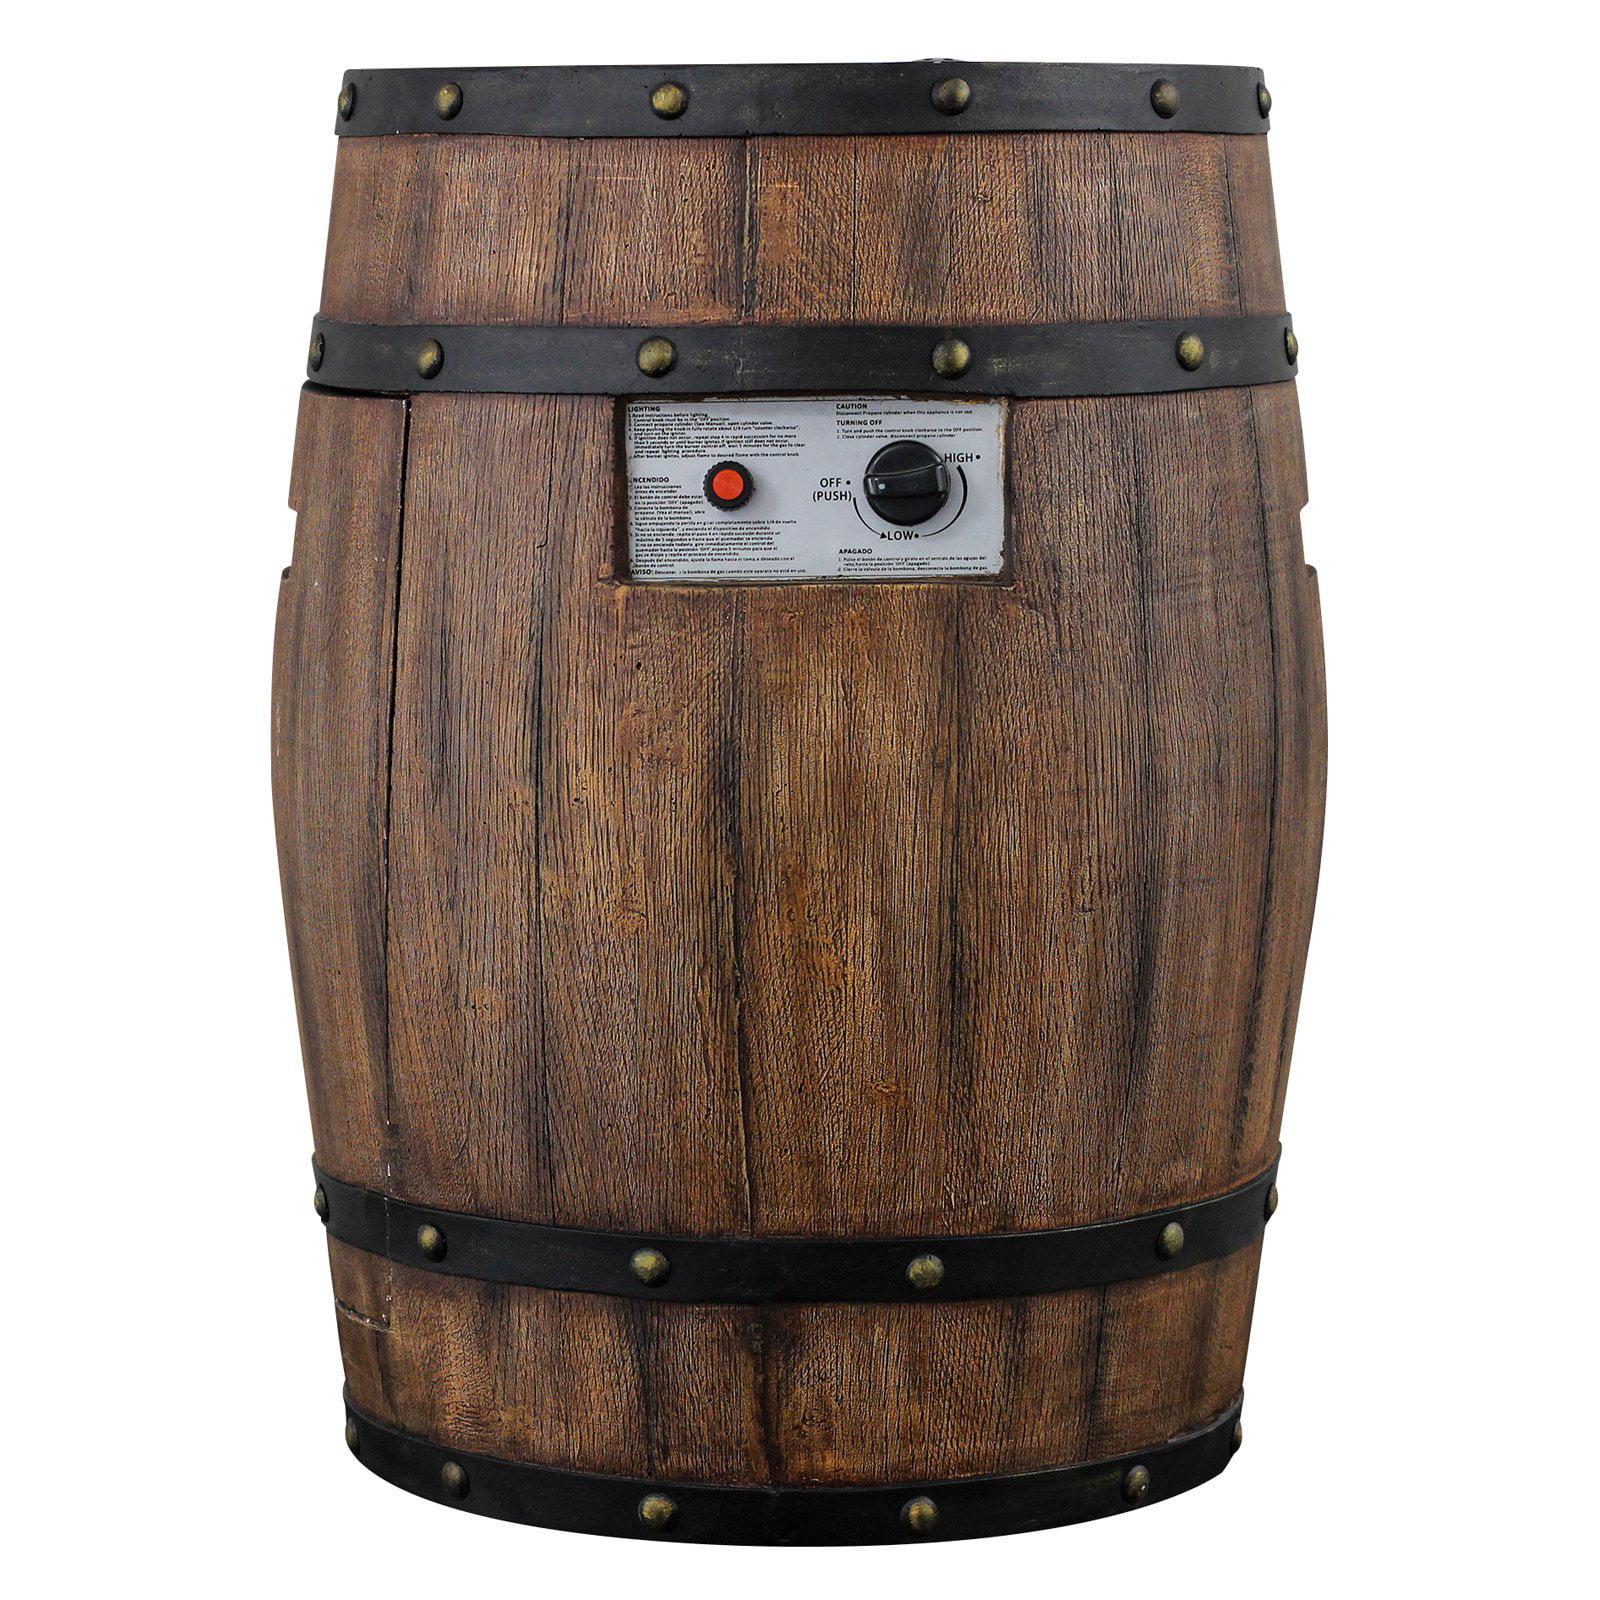 HomComfort Gas Whiskey Barrel Patio Heater by HomComfort